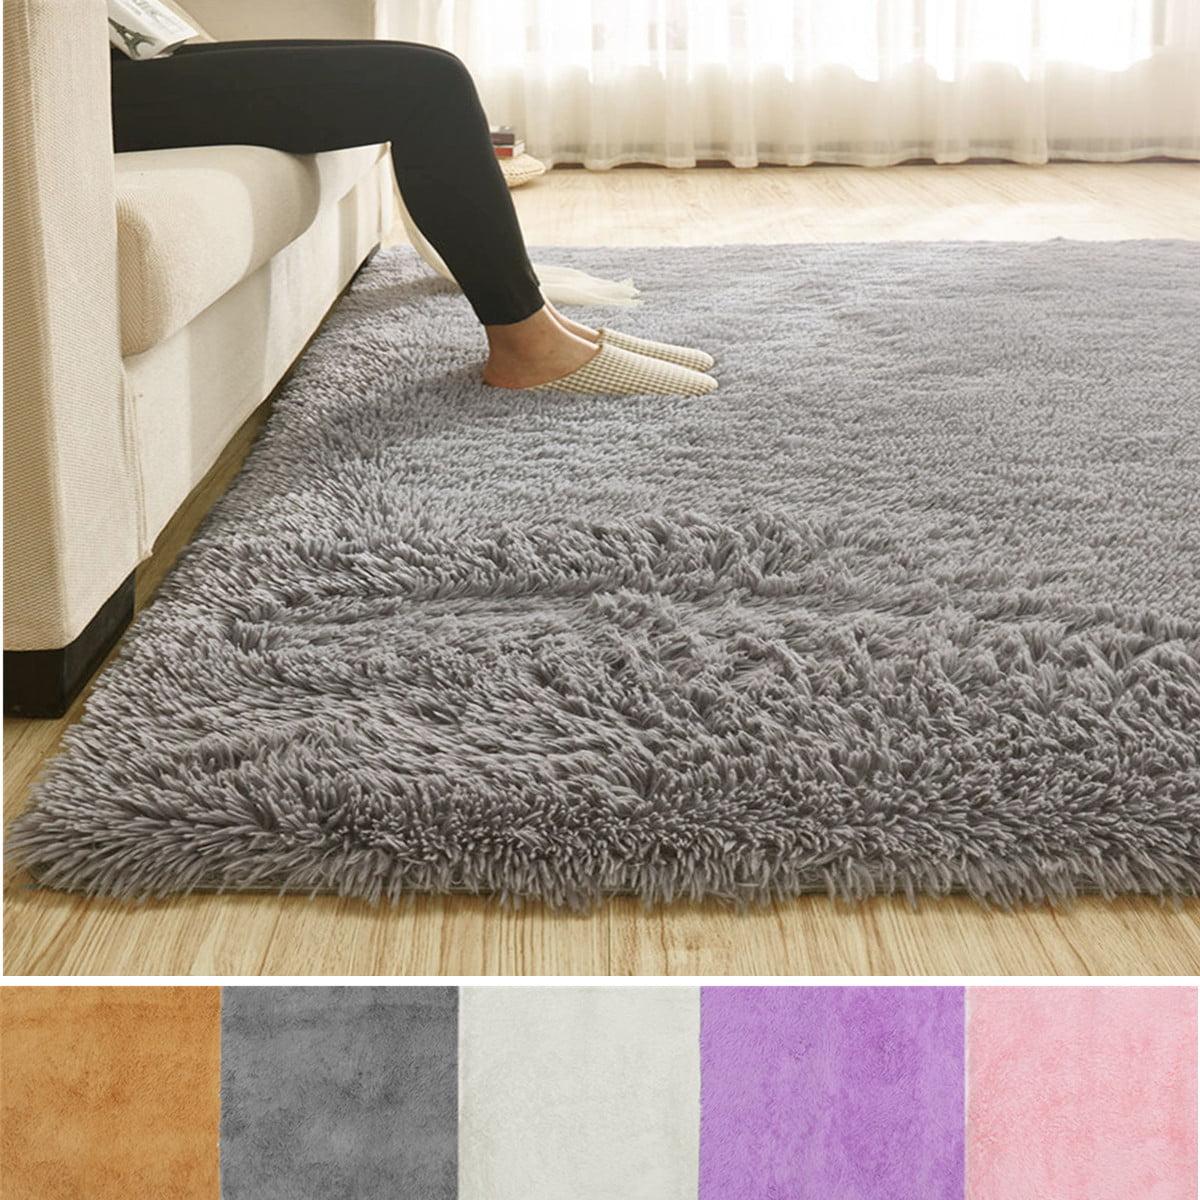 Plush Kids Tent Carpet Rug Mat Bedroom Cushion Replacement Hexagonal Pink